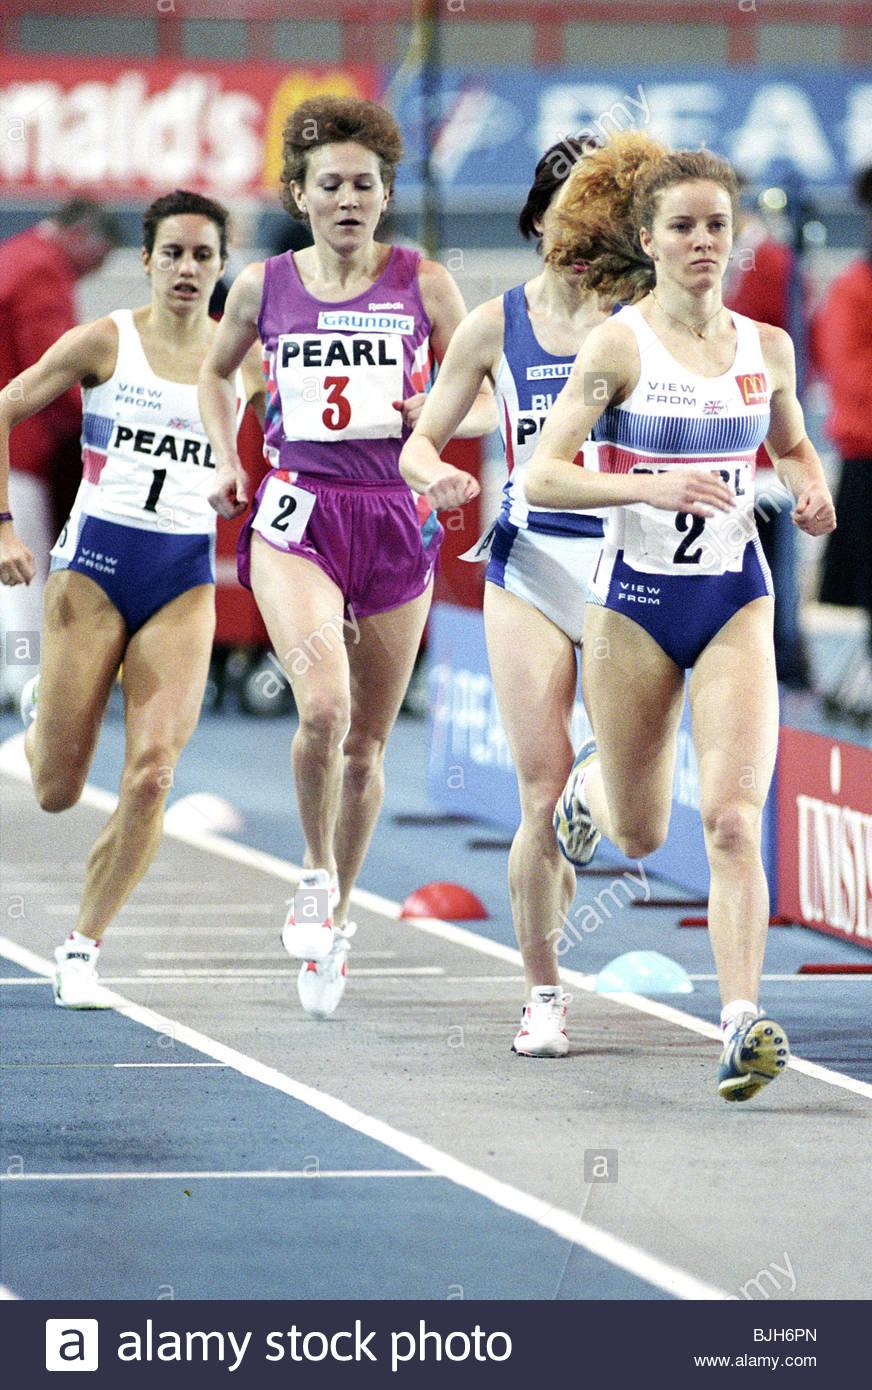 29/01/93 perla internazionali di atletica leggera Kelvin Hall - GLASGOW - Gran Bretagna Jayne Sparke (destra) in Immagini Stock